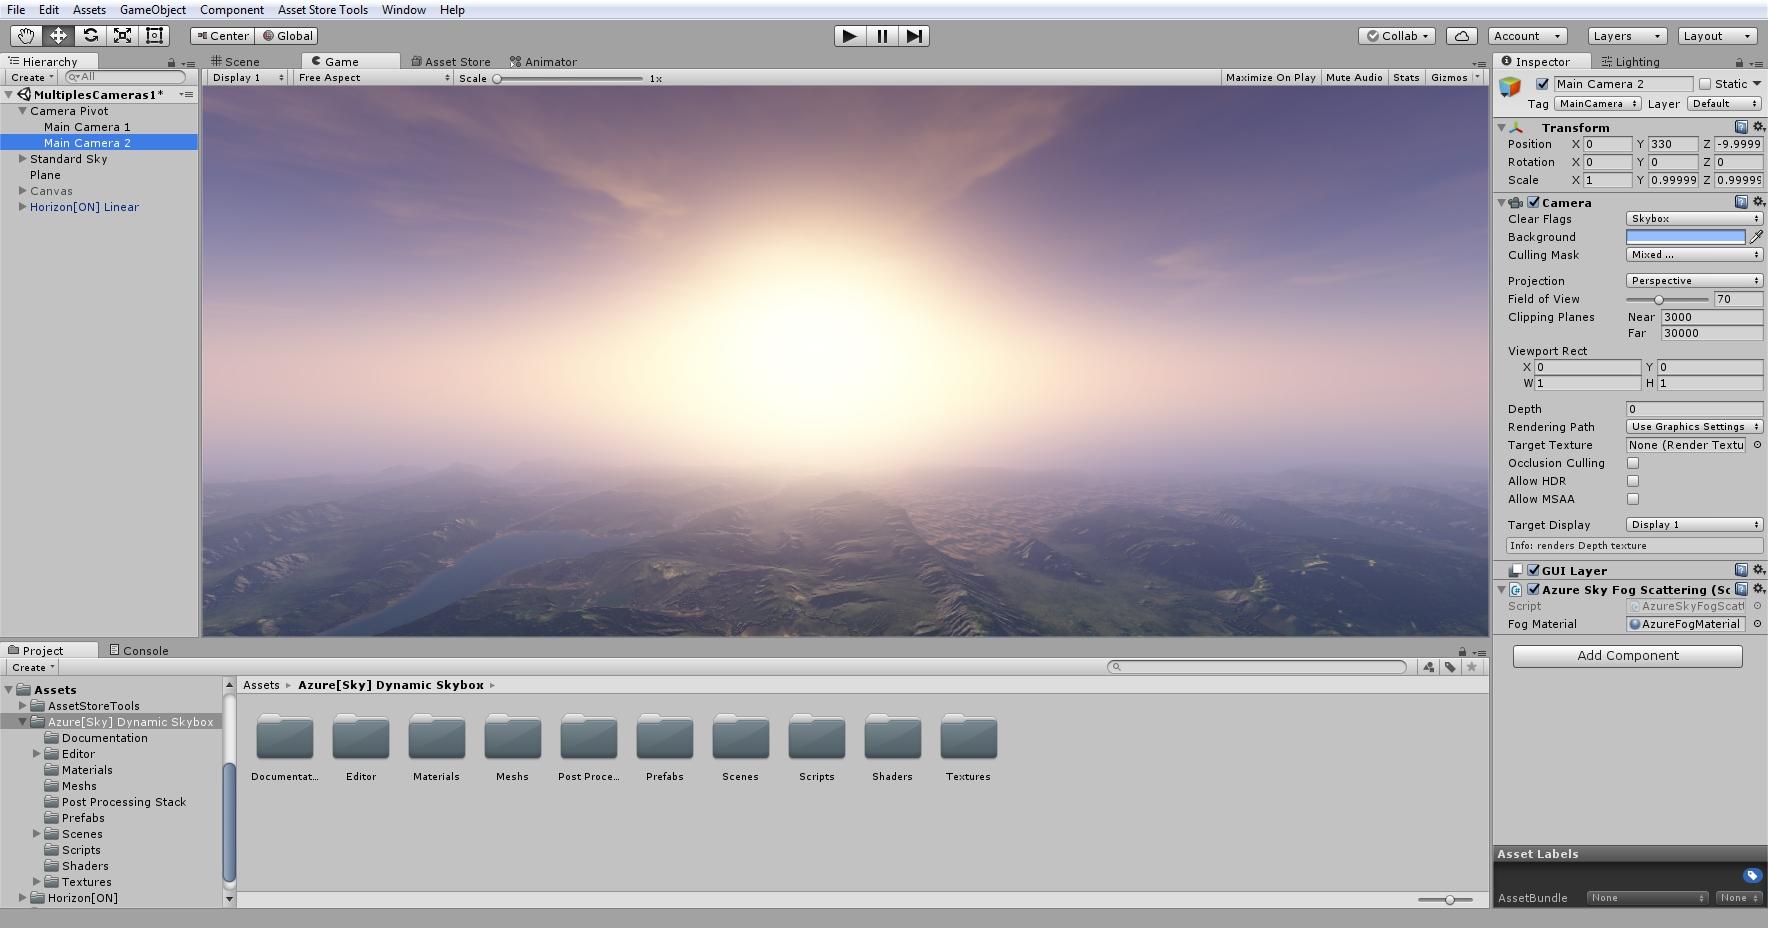 Azure[Sky] - Dynamic Skybox | Page 12 - Unity Forum